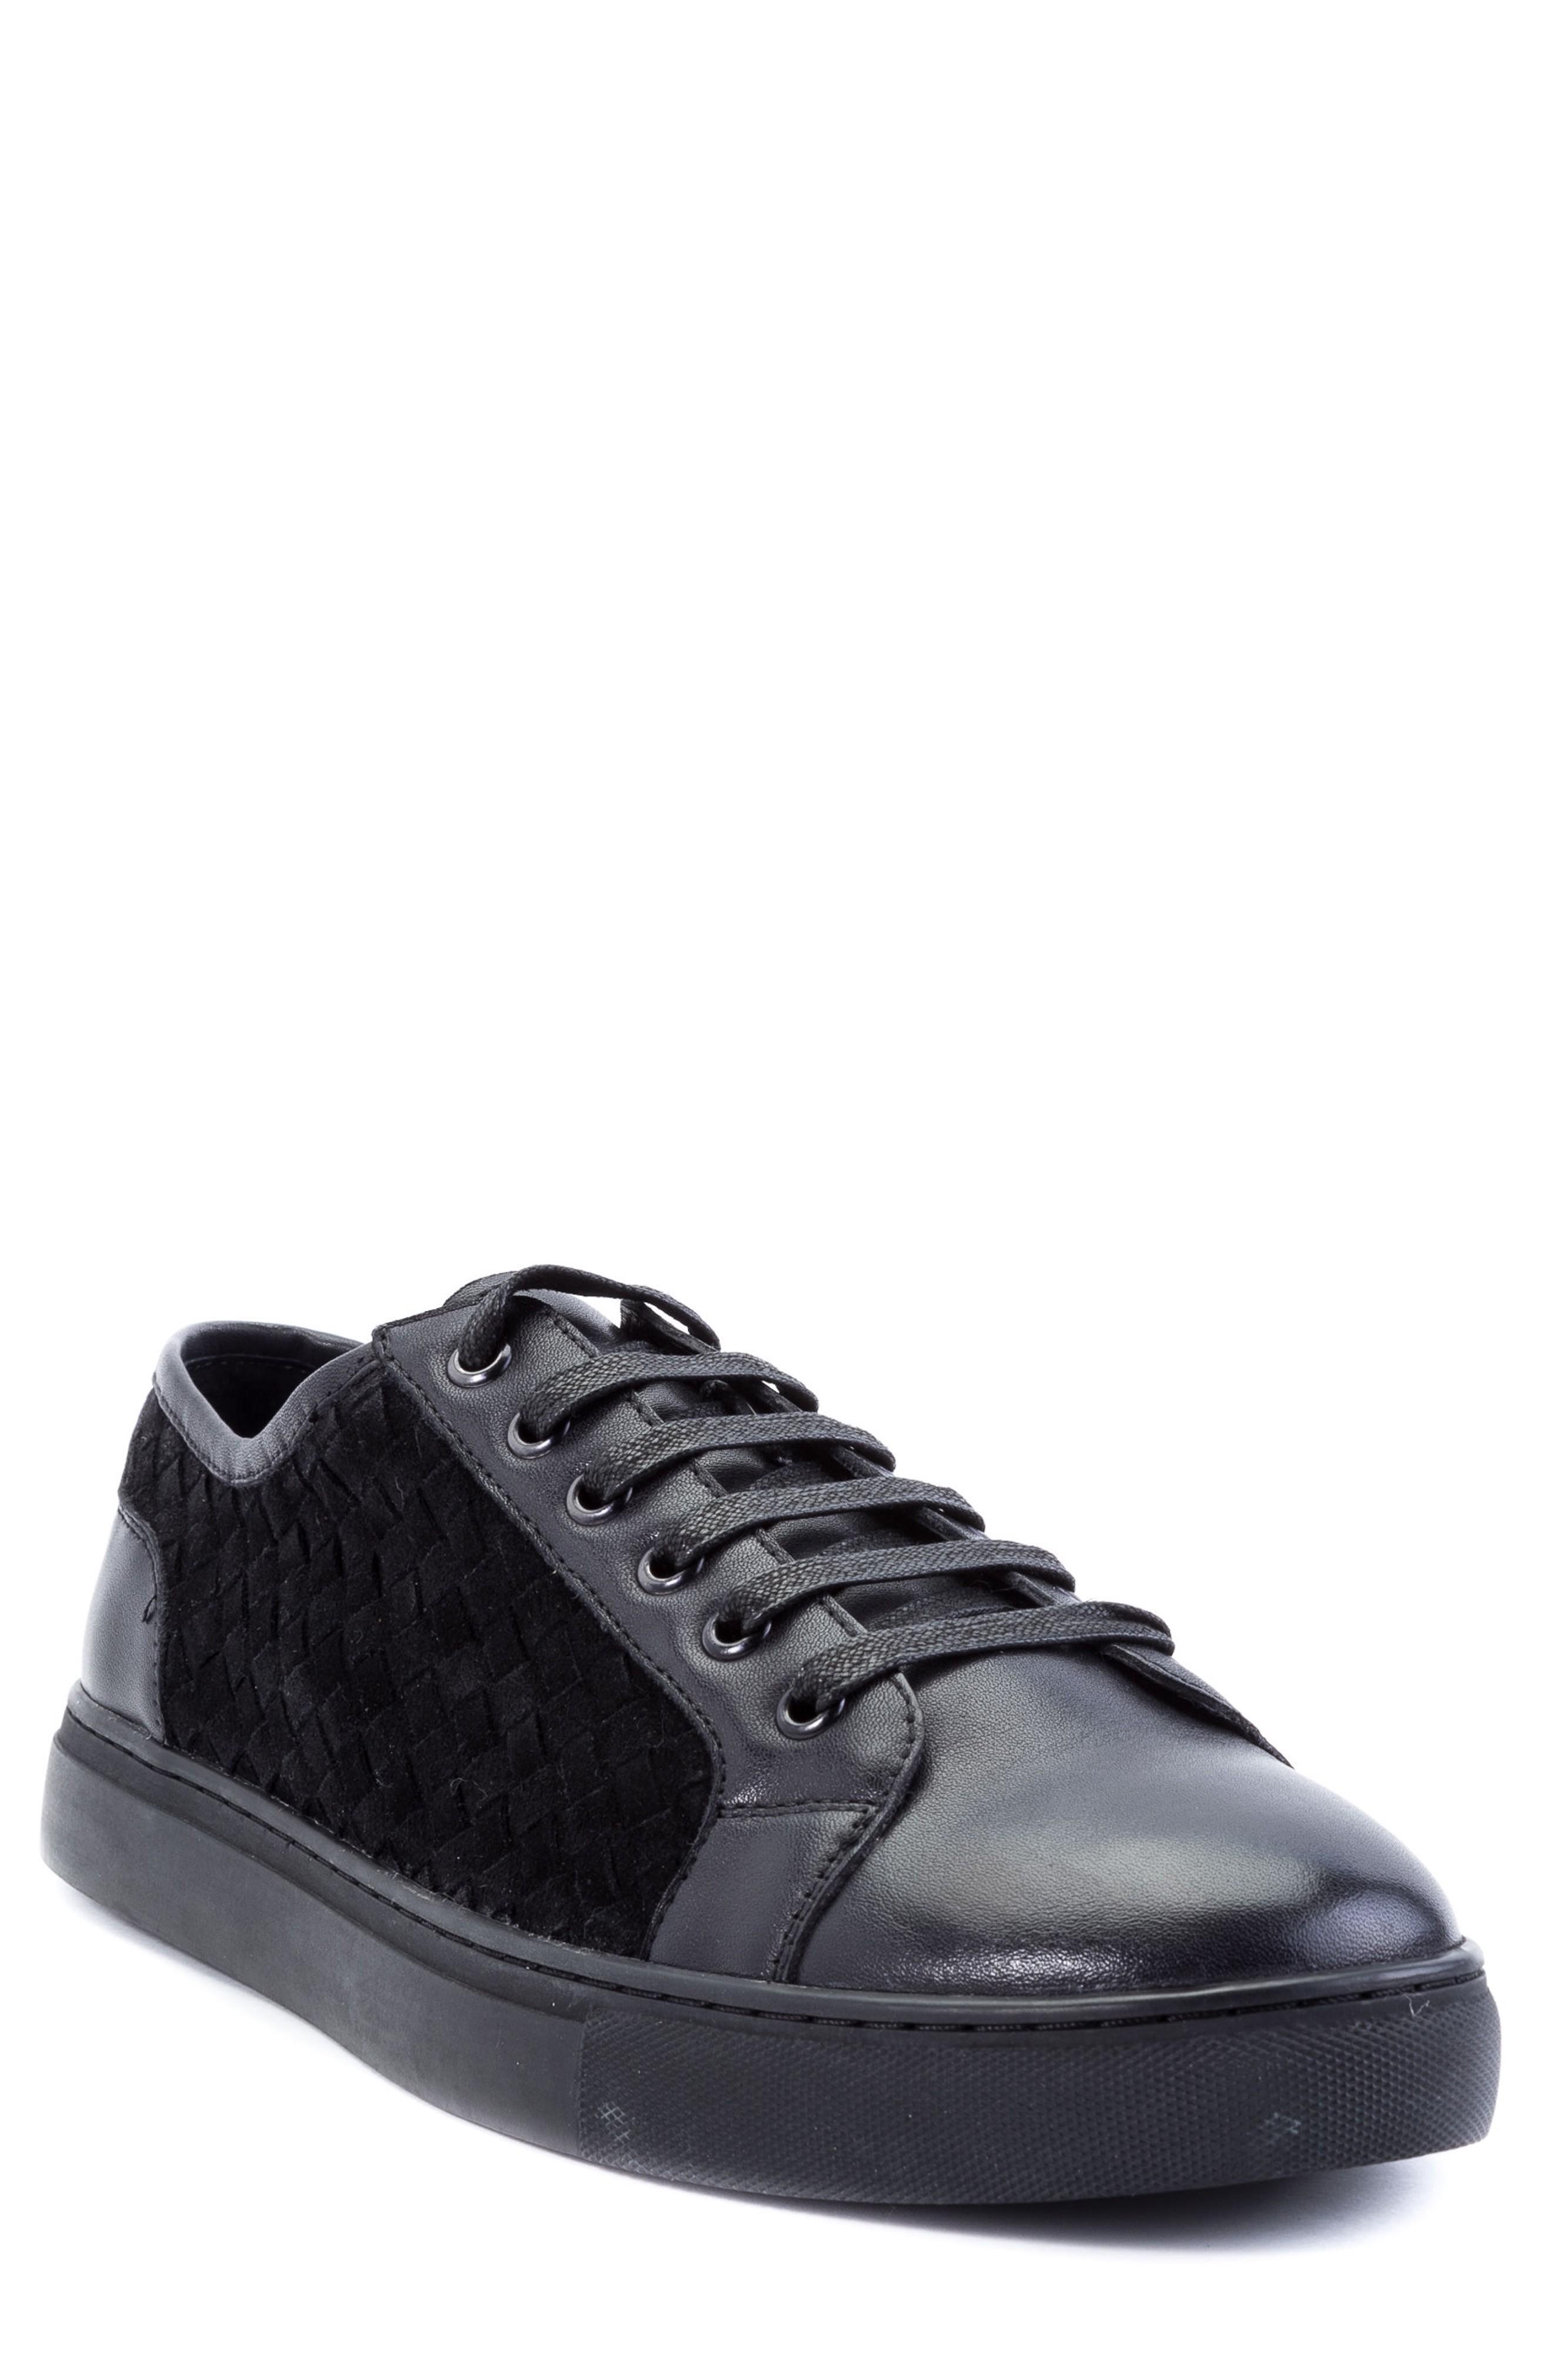 Zanzara Player Woven Low Top Sneaker In Black Leather/ Suede